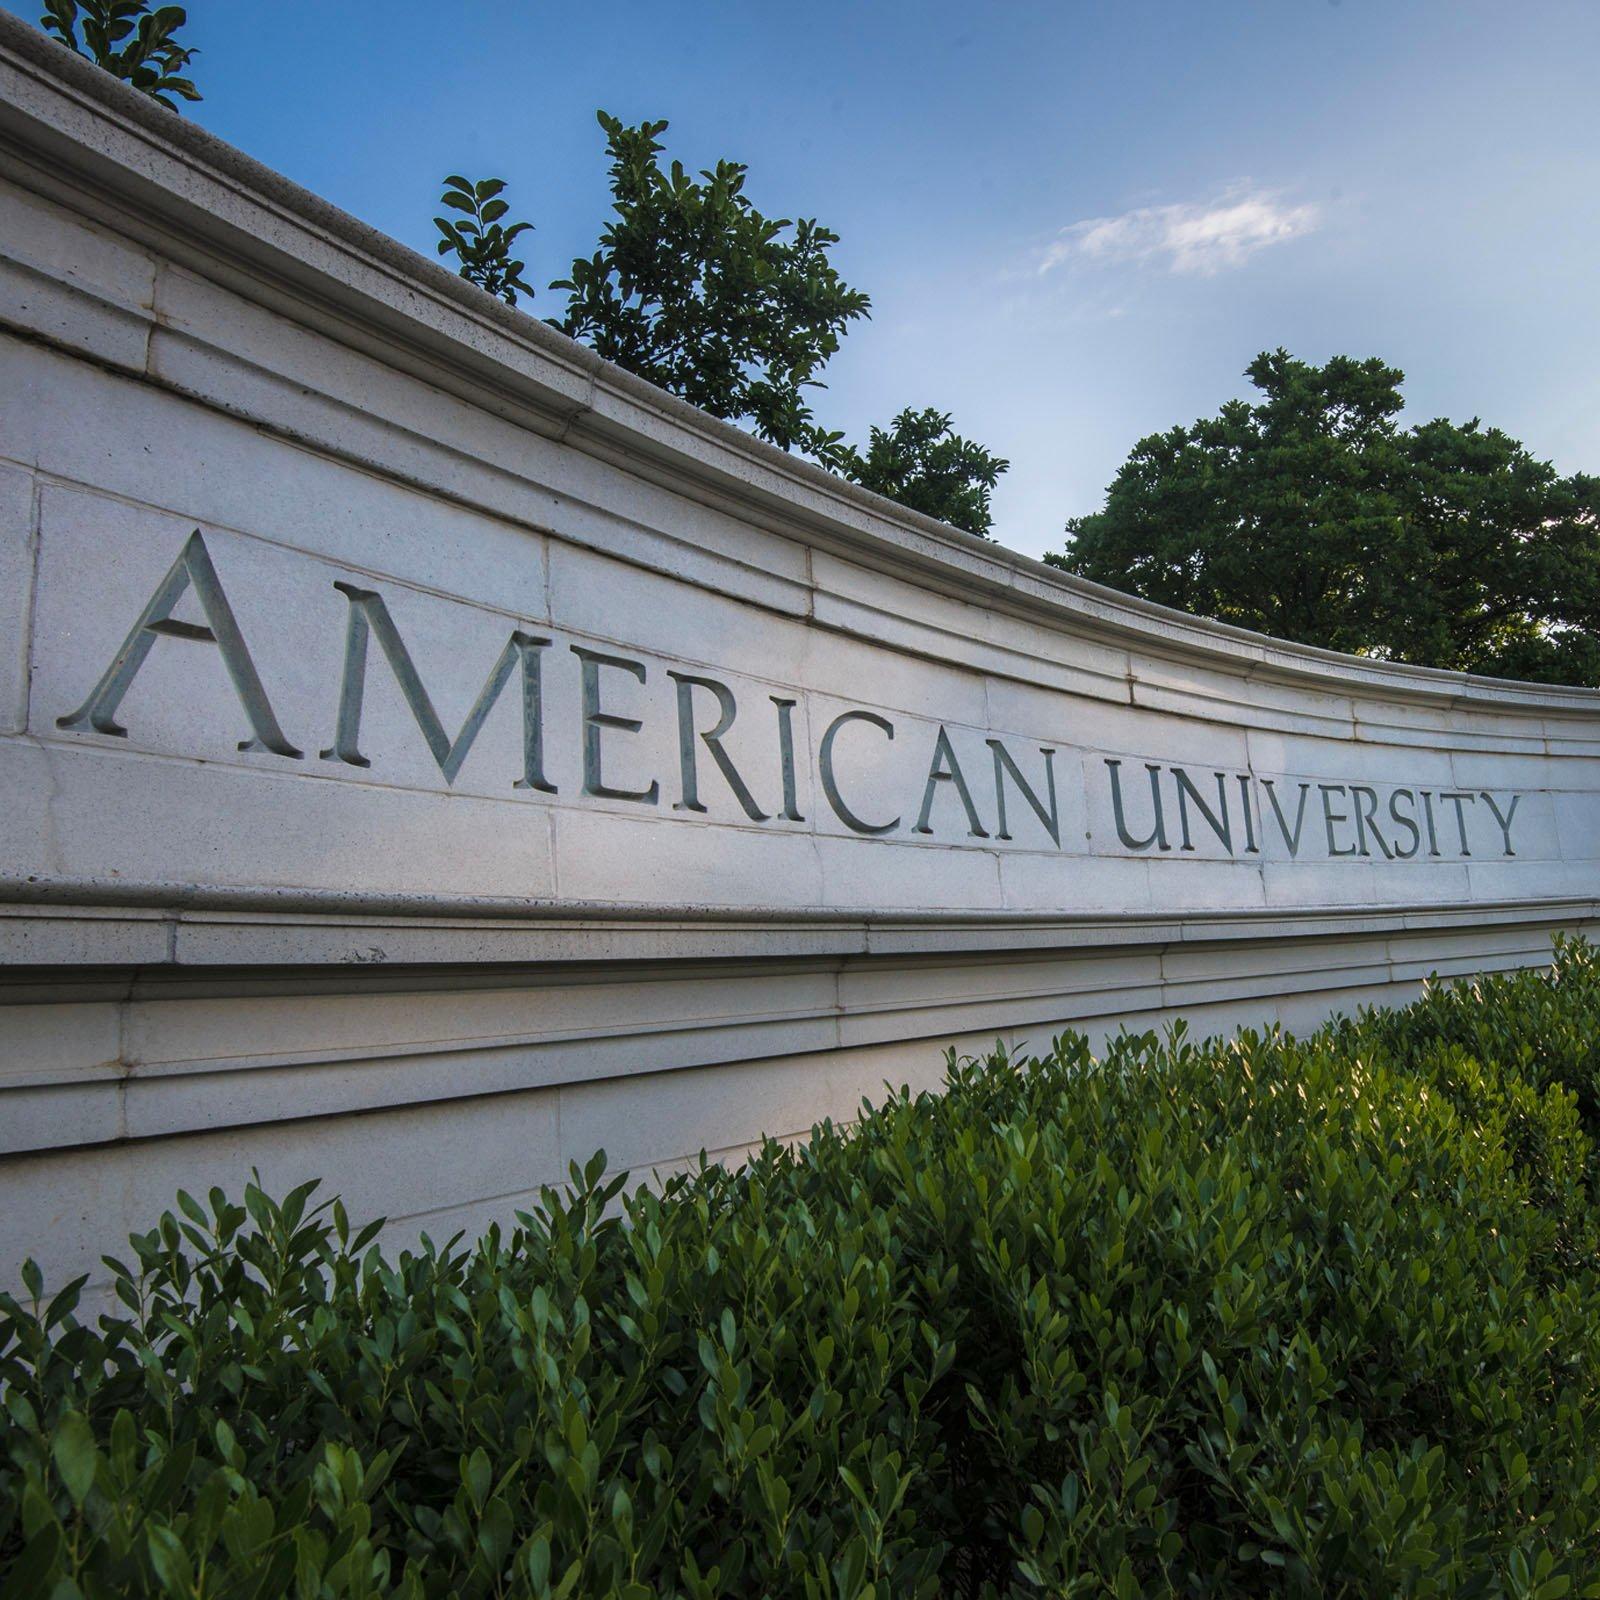 American University sign